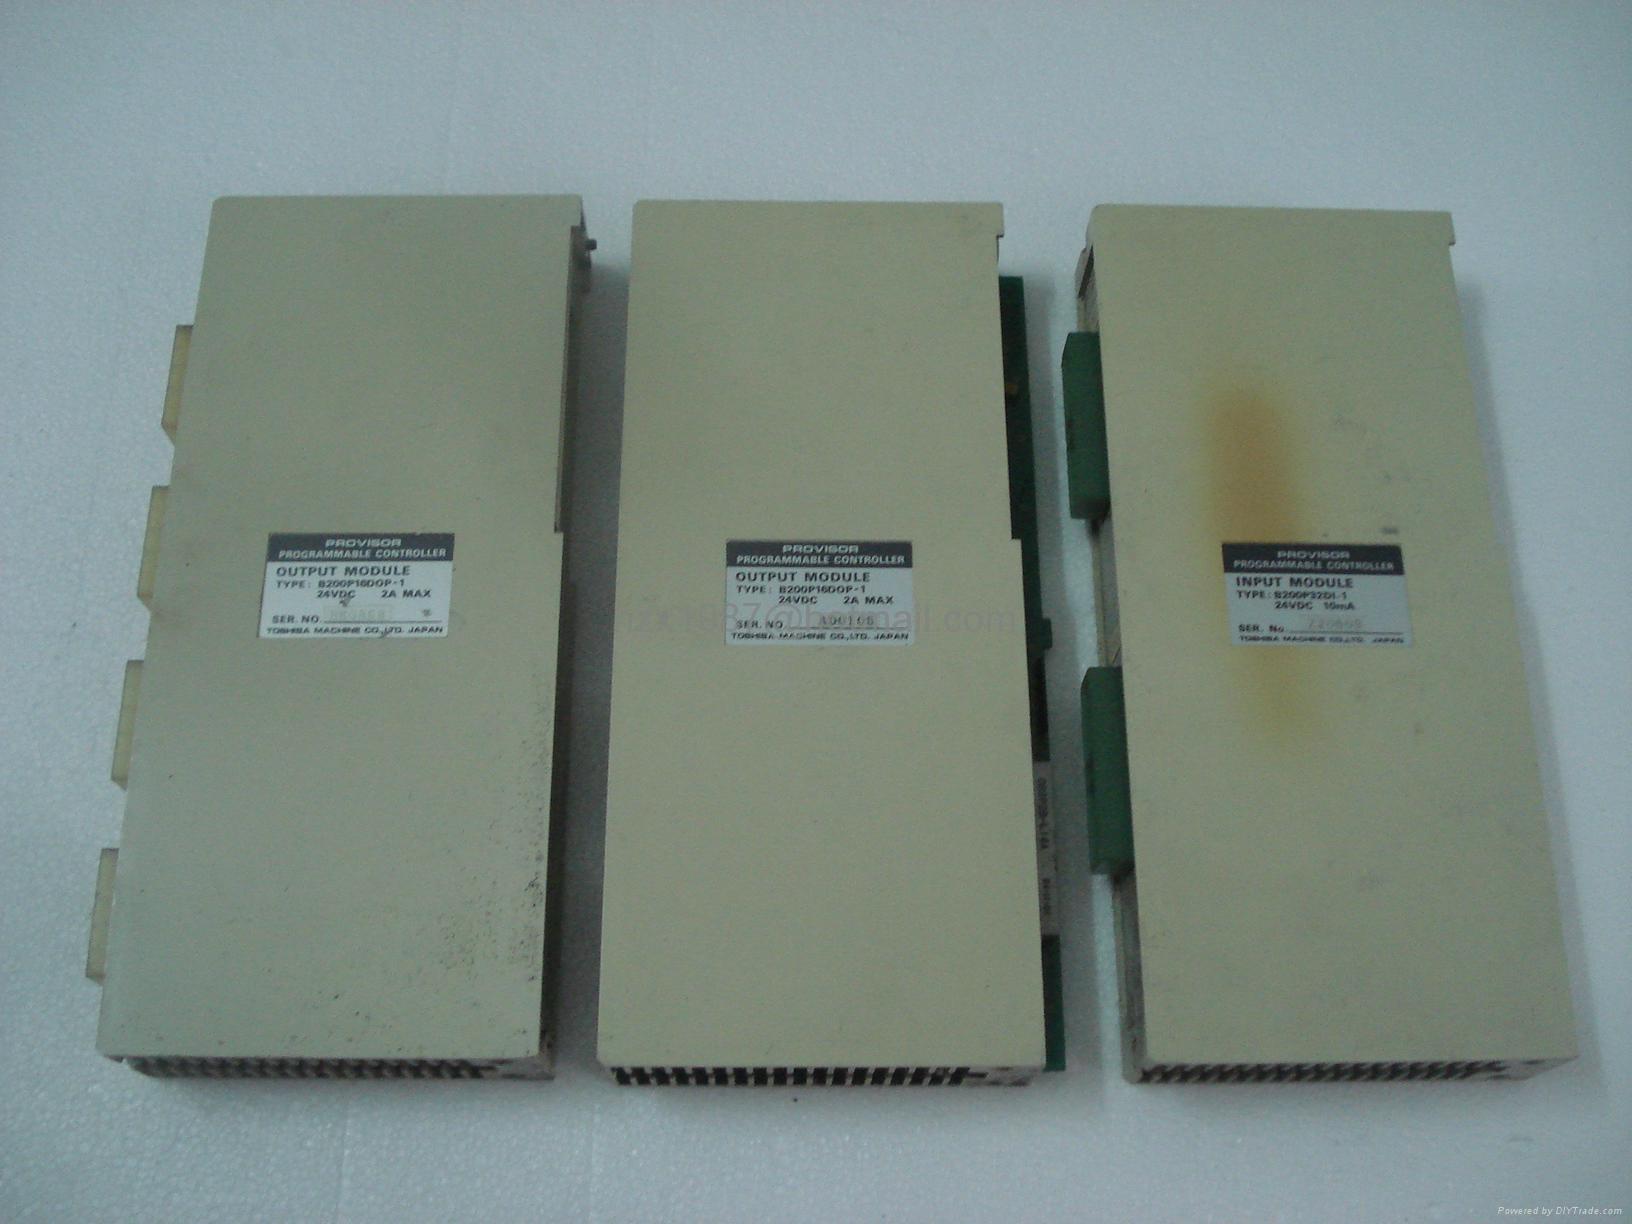 销售及维修显示器V30 ,V21 ,V710,东芝EC40NII-1Y EC40 NII-1Y机维修 10